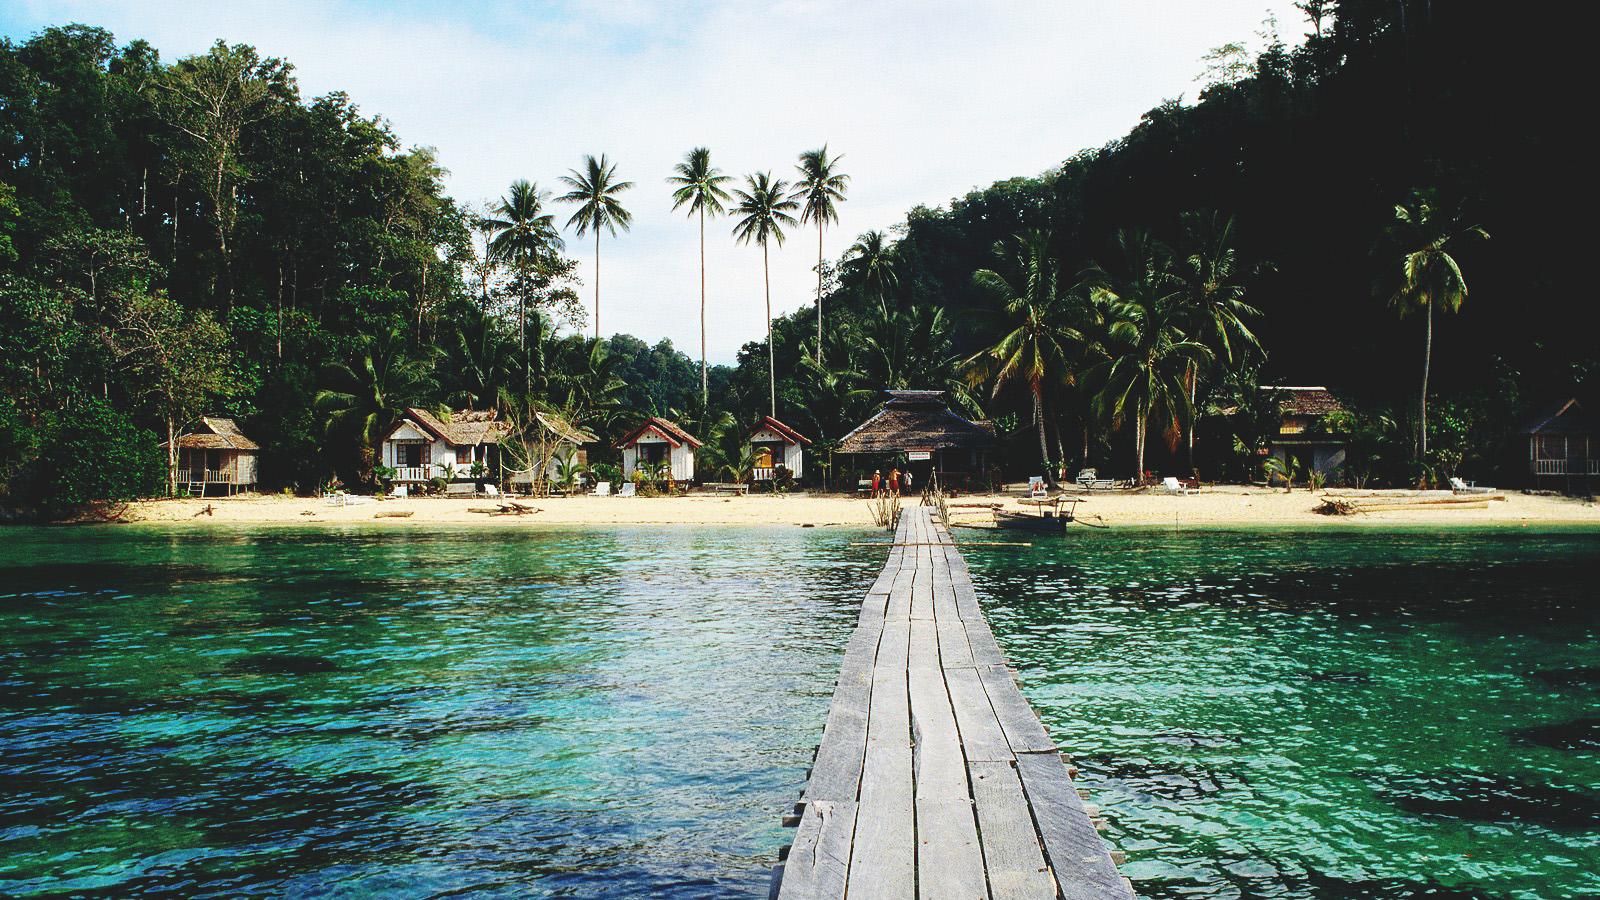 Sulawesi discover toraja 3.jpg